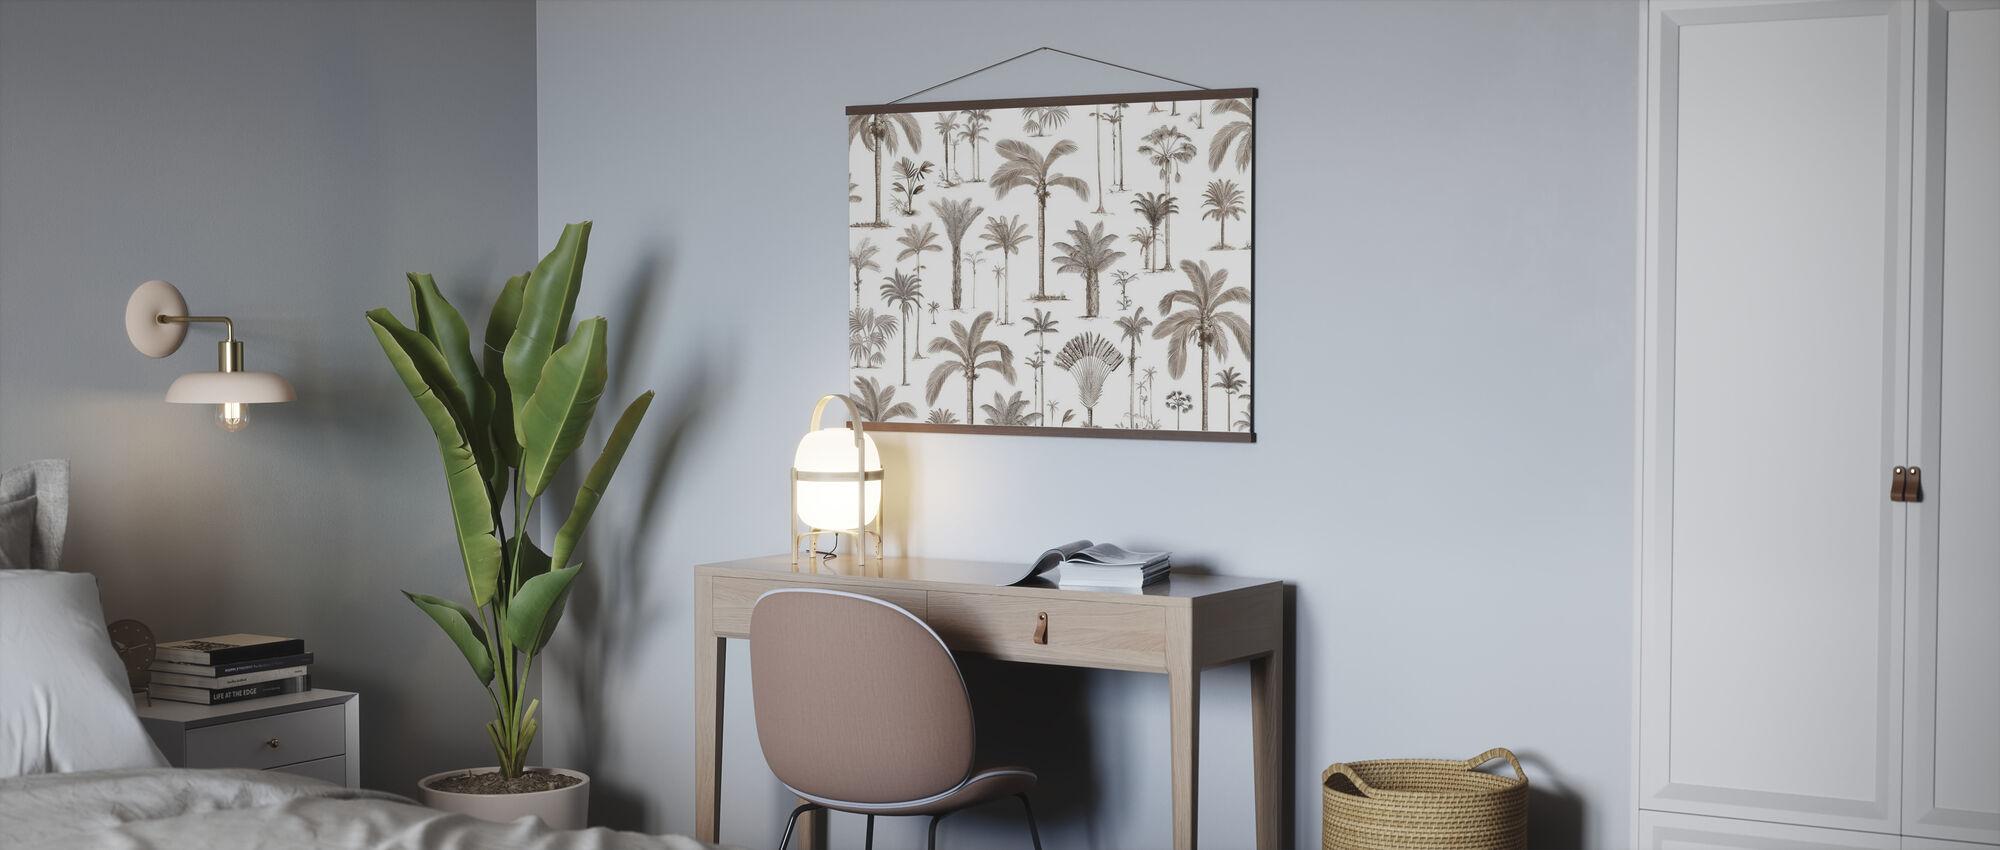 Brasilianske palmer - Sepia - Plakat - Kontor